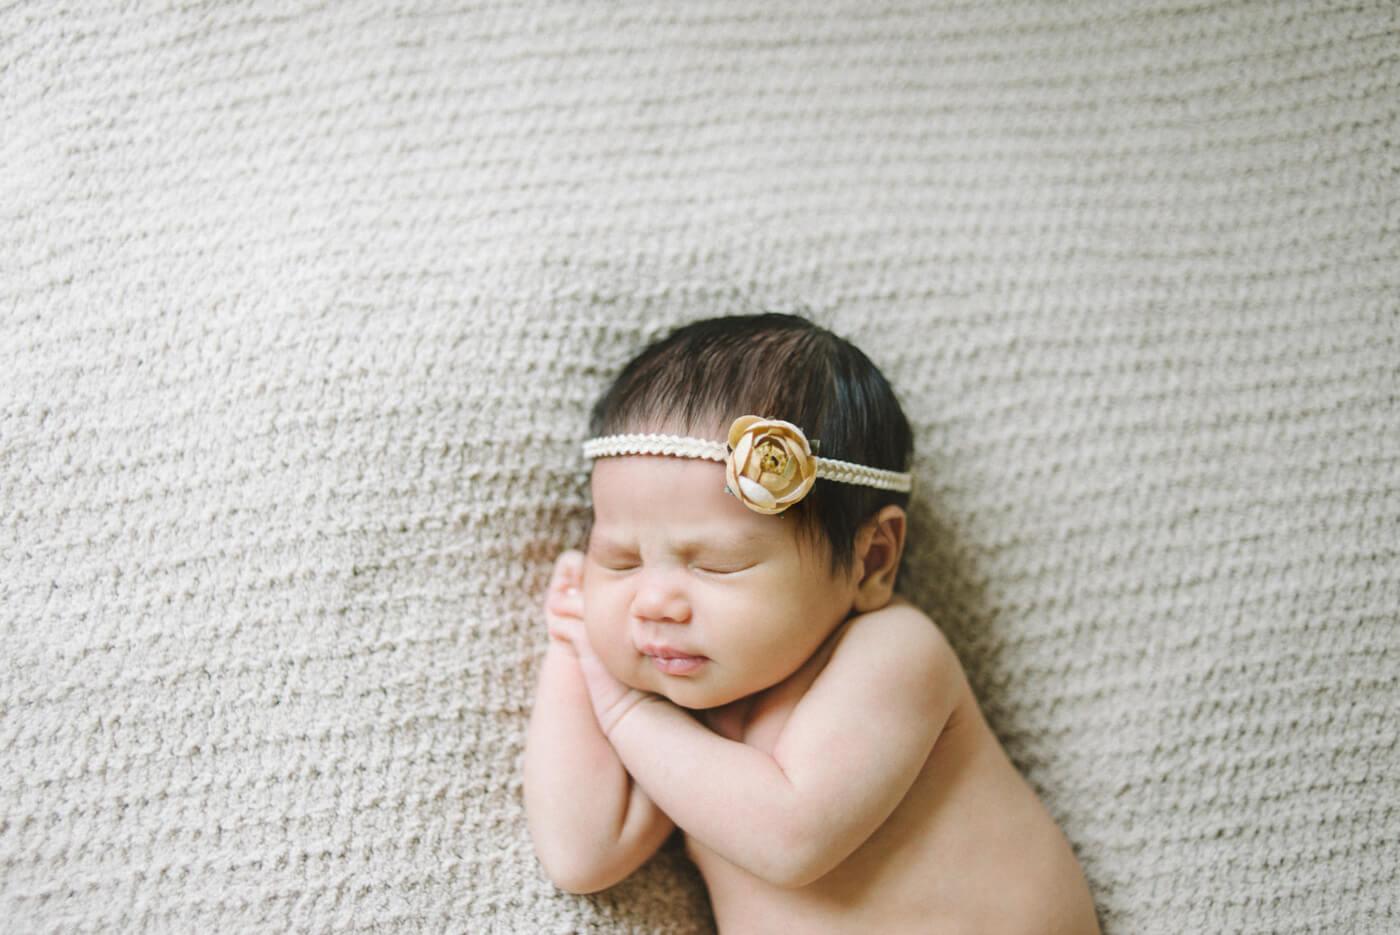 best_newborn_photographer_portland_oregon_cream_and_yellow_flower_headband_prayer_holding_hands_shelley_marie_photography_3.jpg